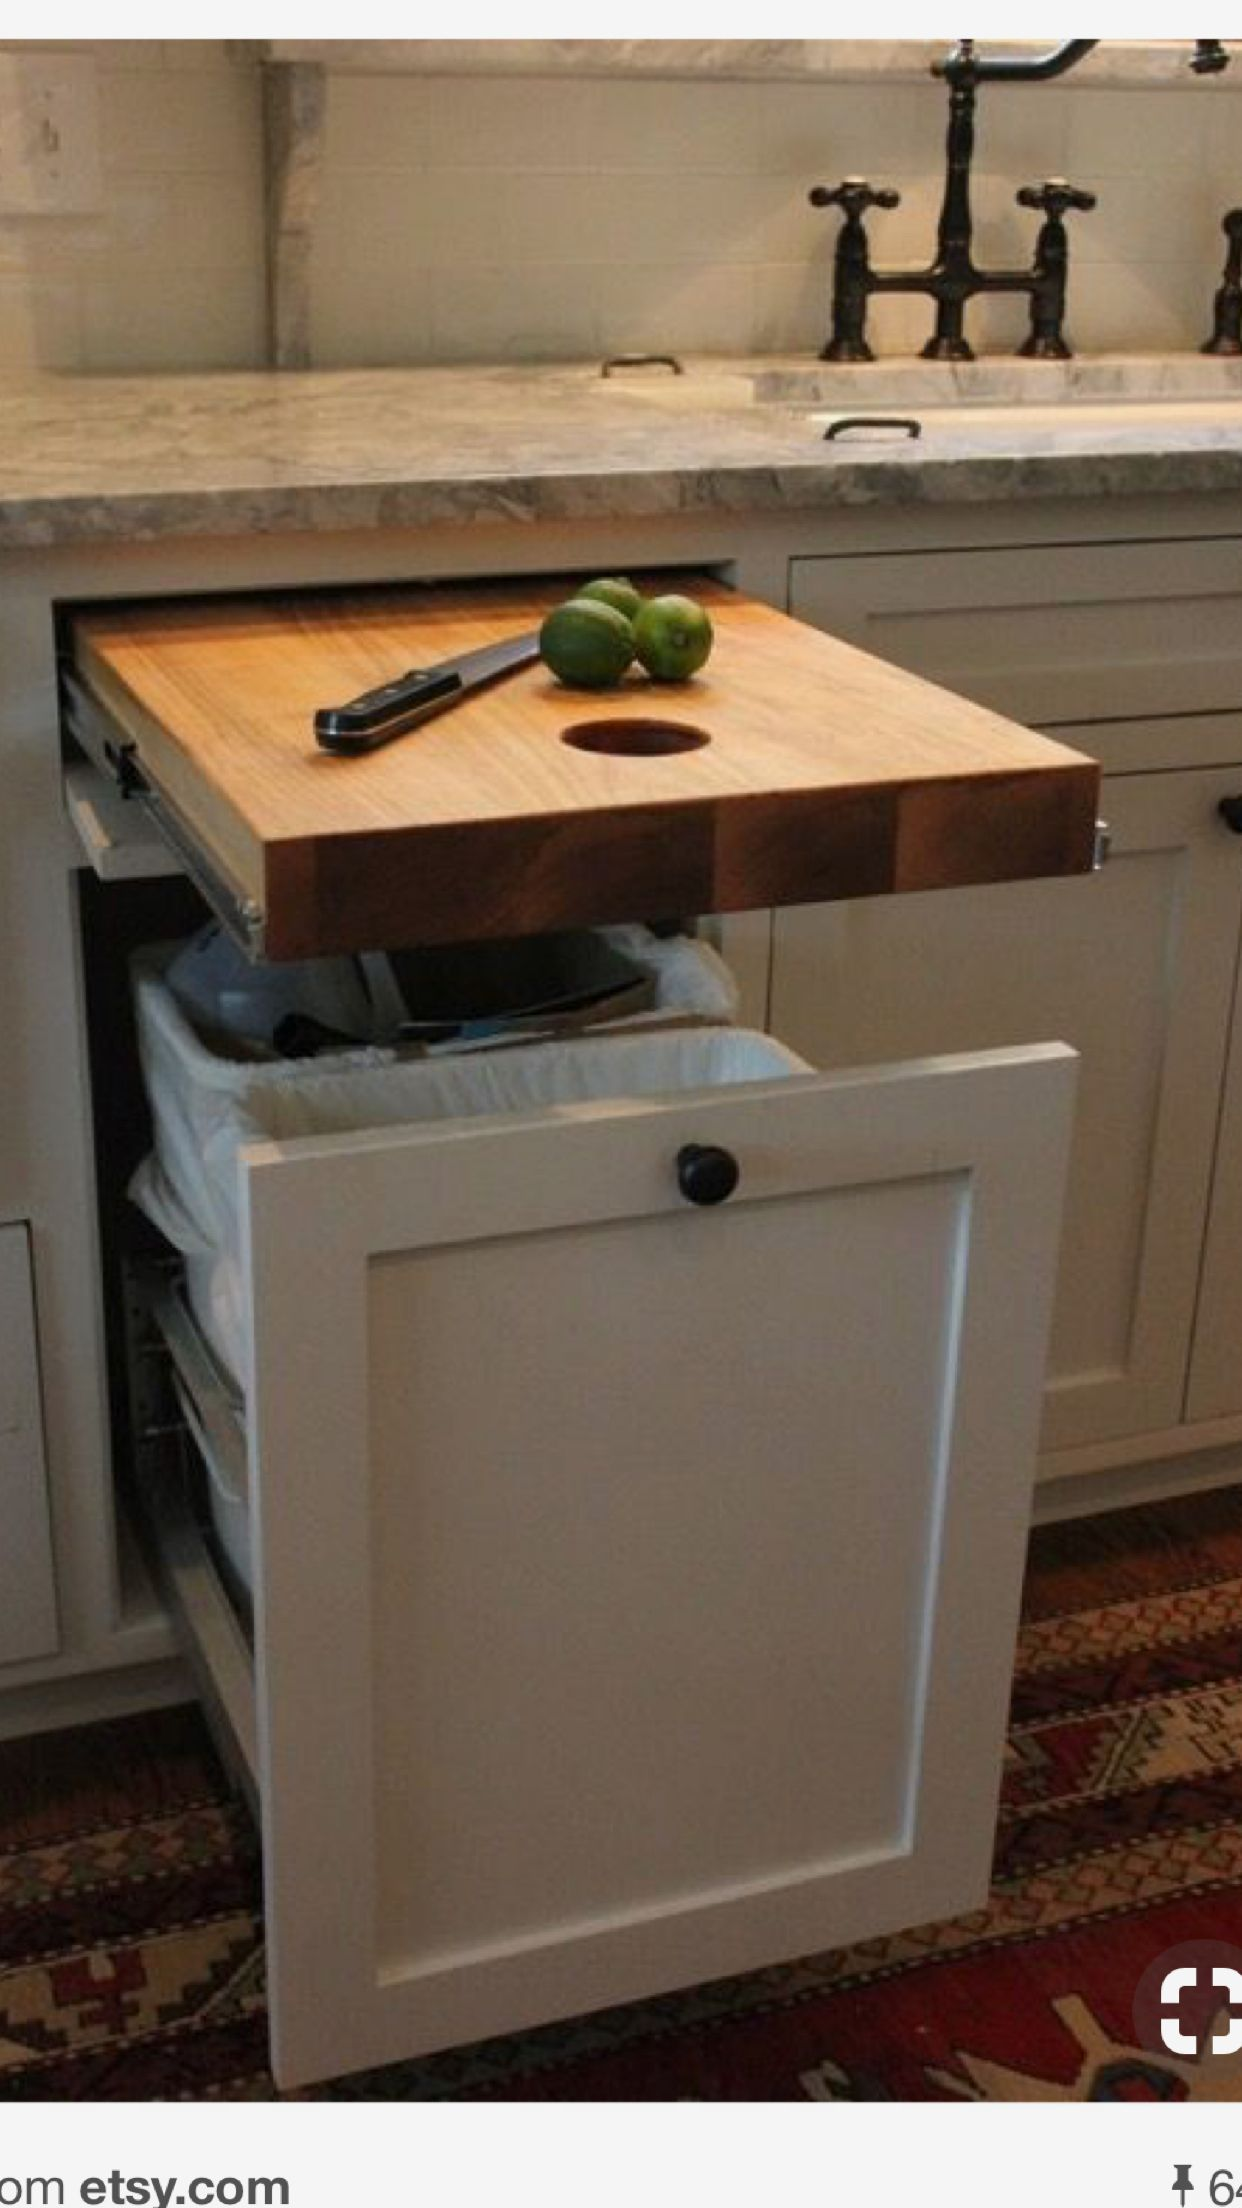 Küchendesign diy pin by brenda pretko on home sweet home  pinterest  kitchens